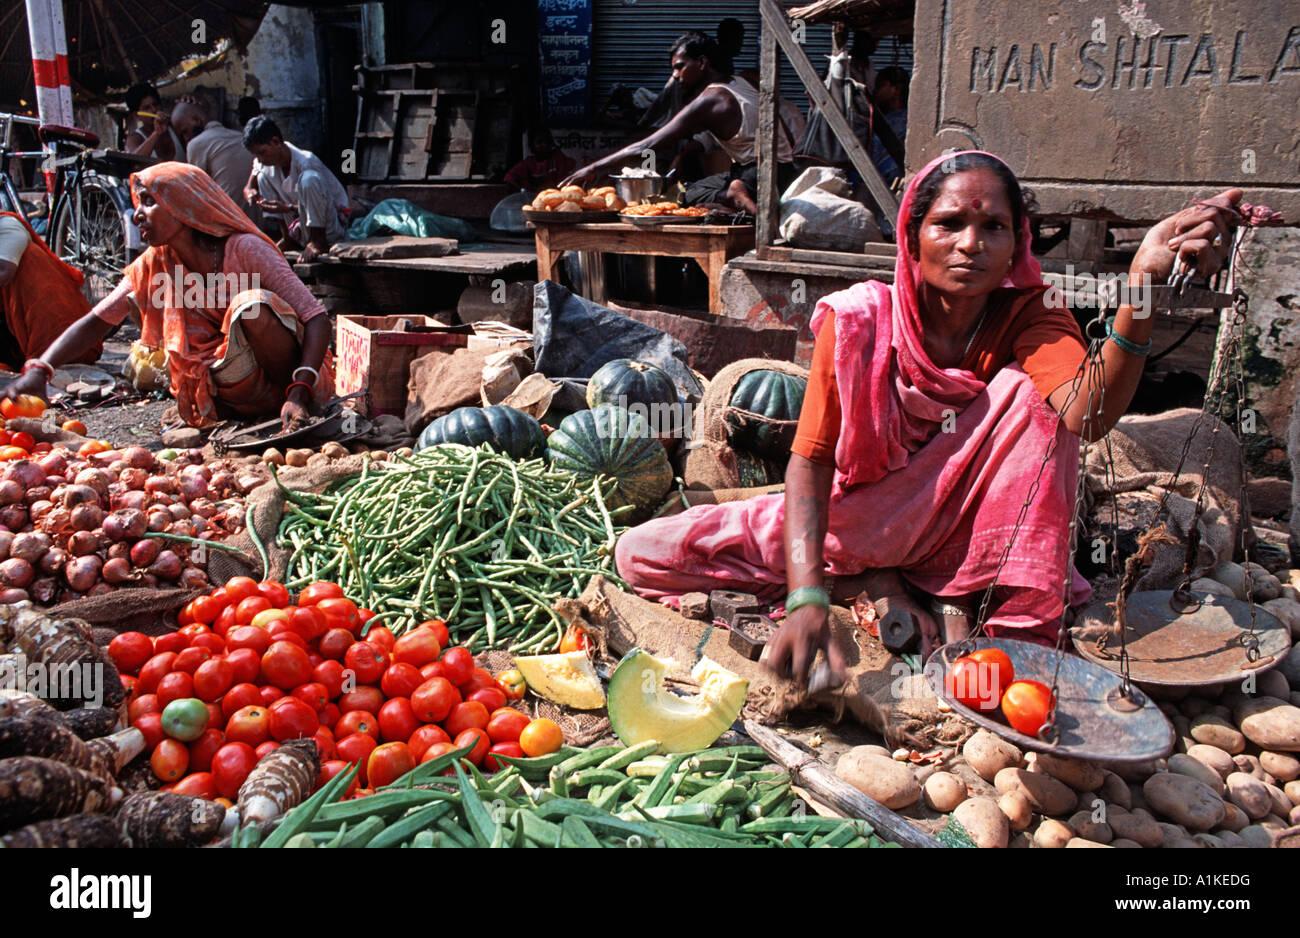 Indian woman vending fruit and vegetables at a market in Varanasi Uttar Pradesh India - Stock Image